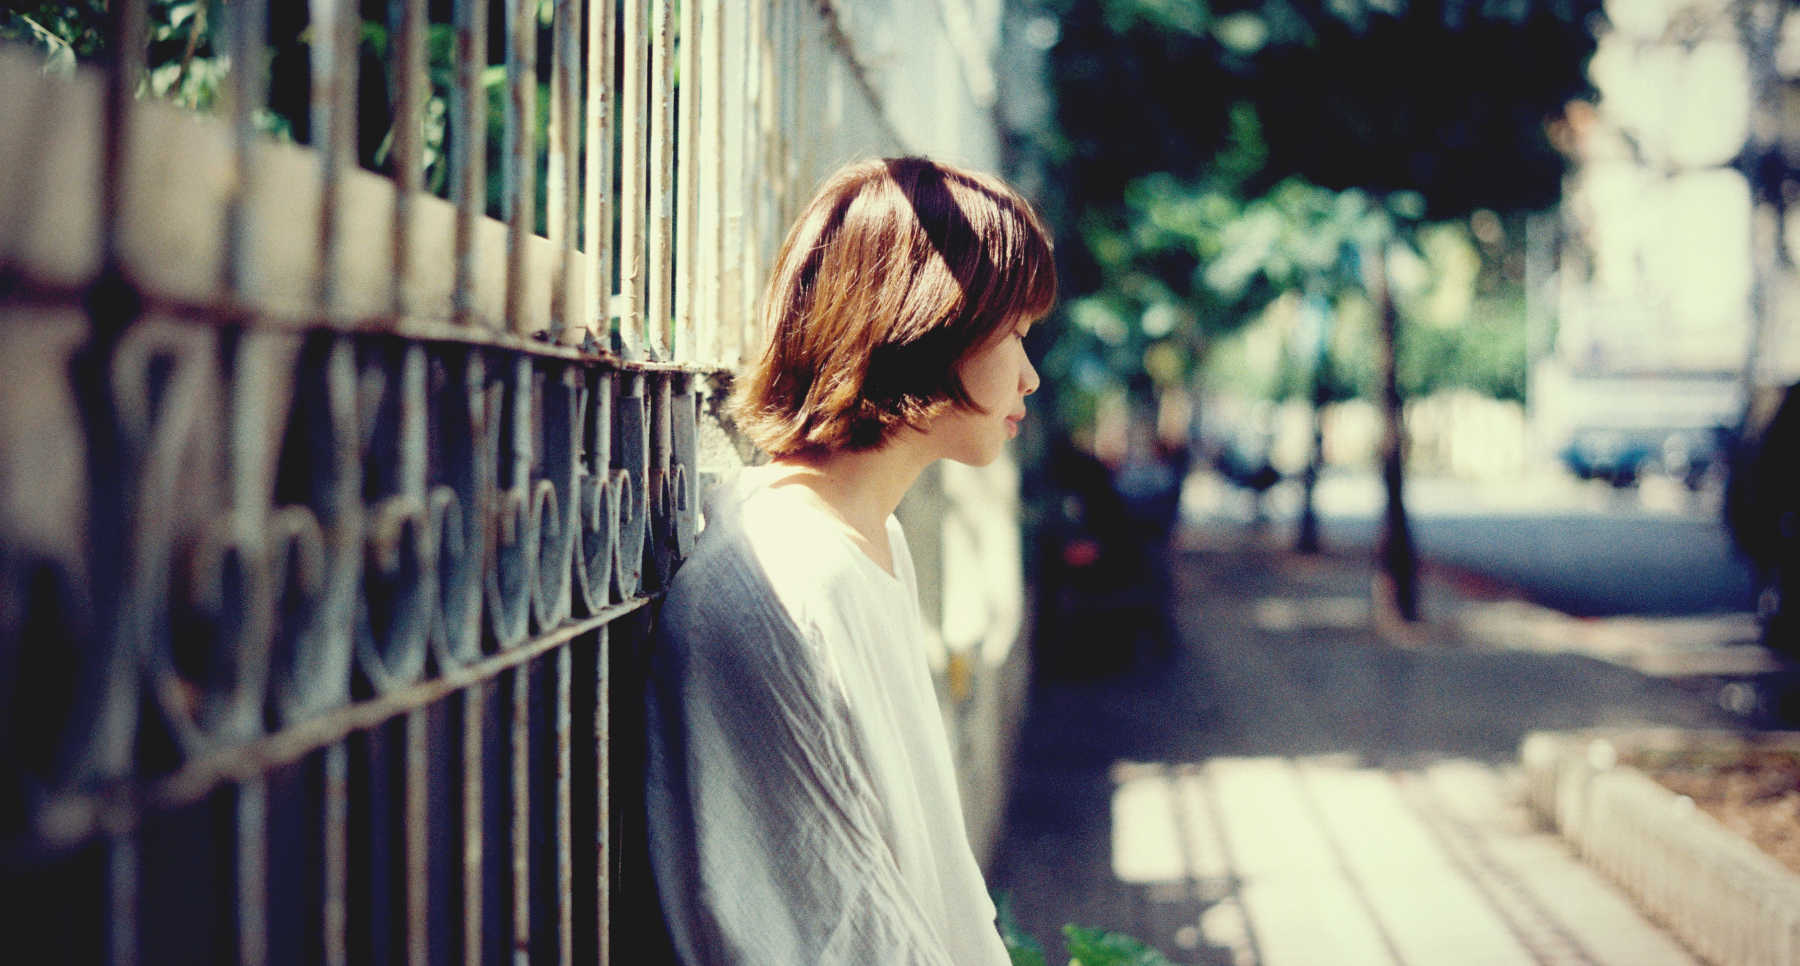 Sad girl by fence